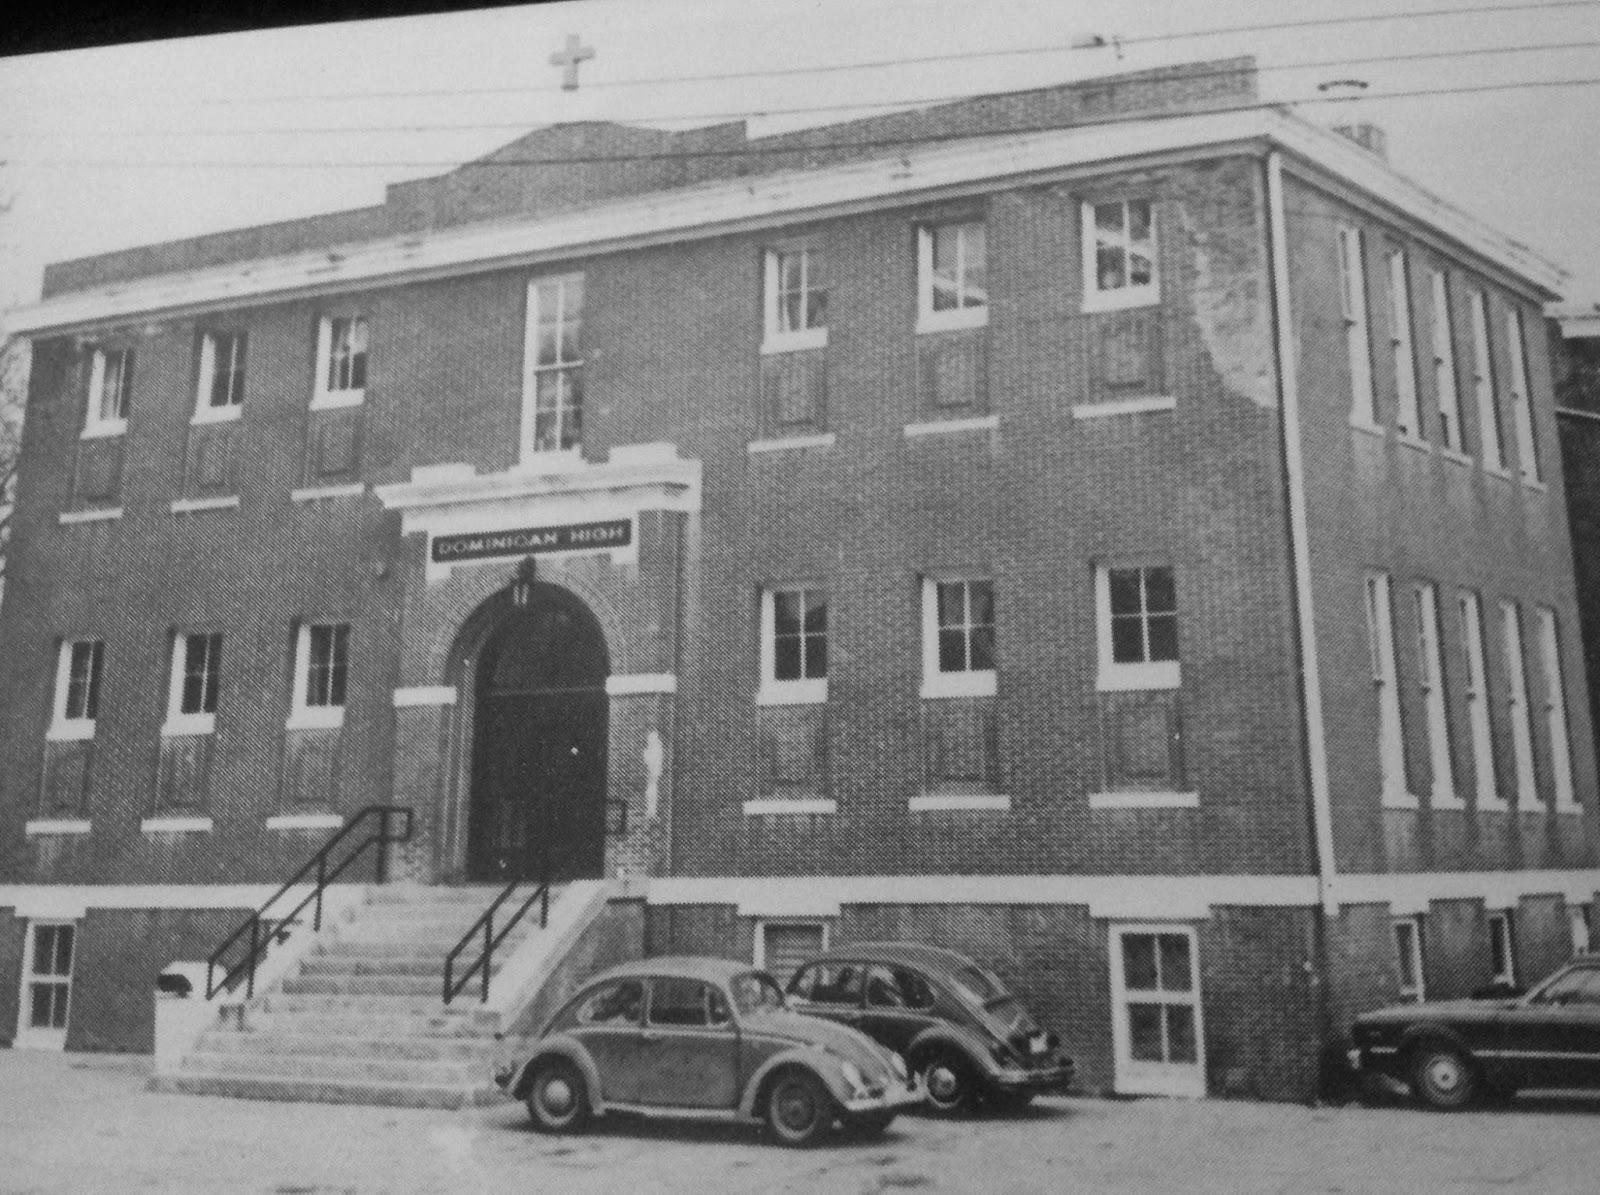 Dominican High School, N. 27th and Fowler, North Omaha, Nebraska